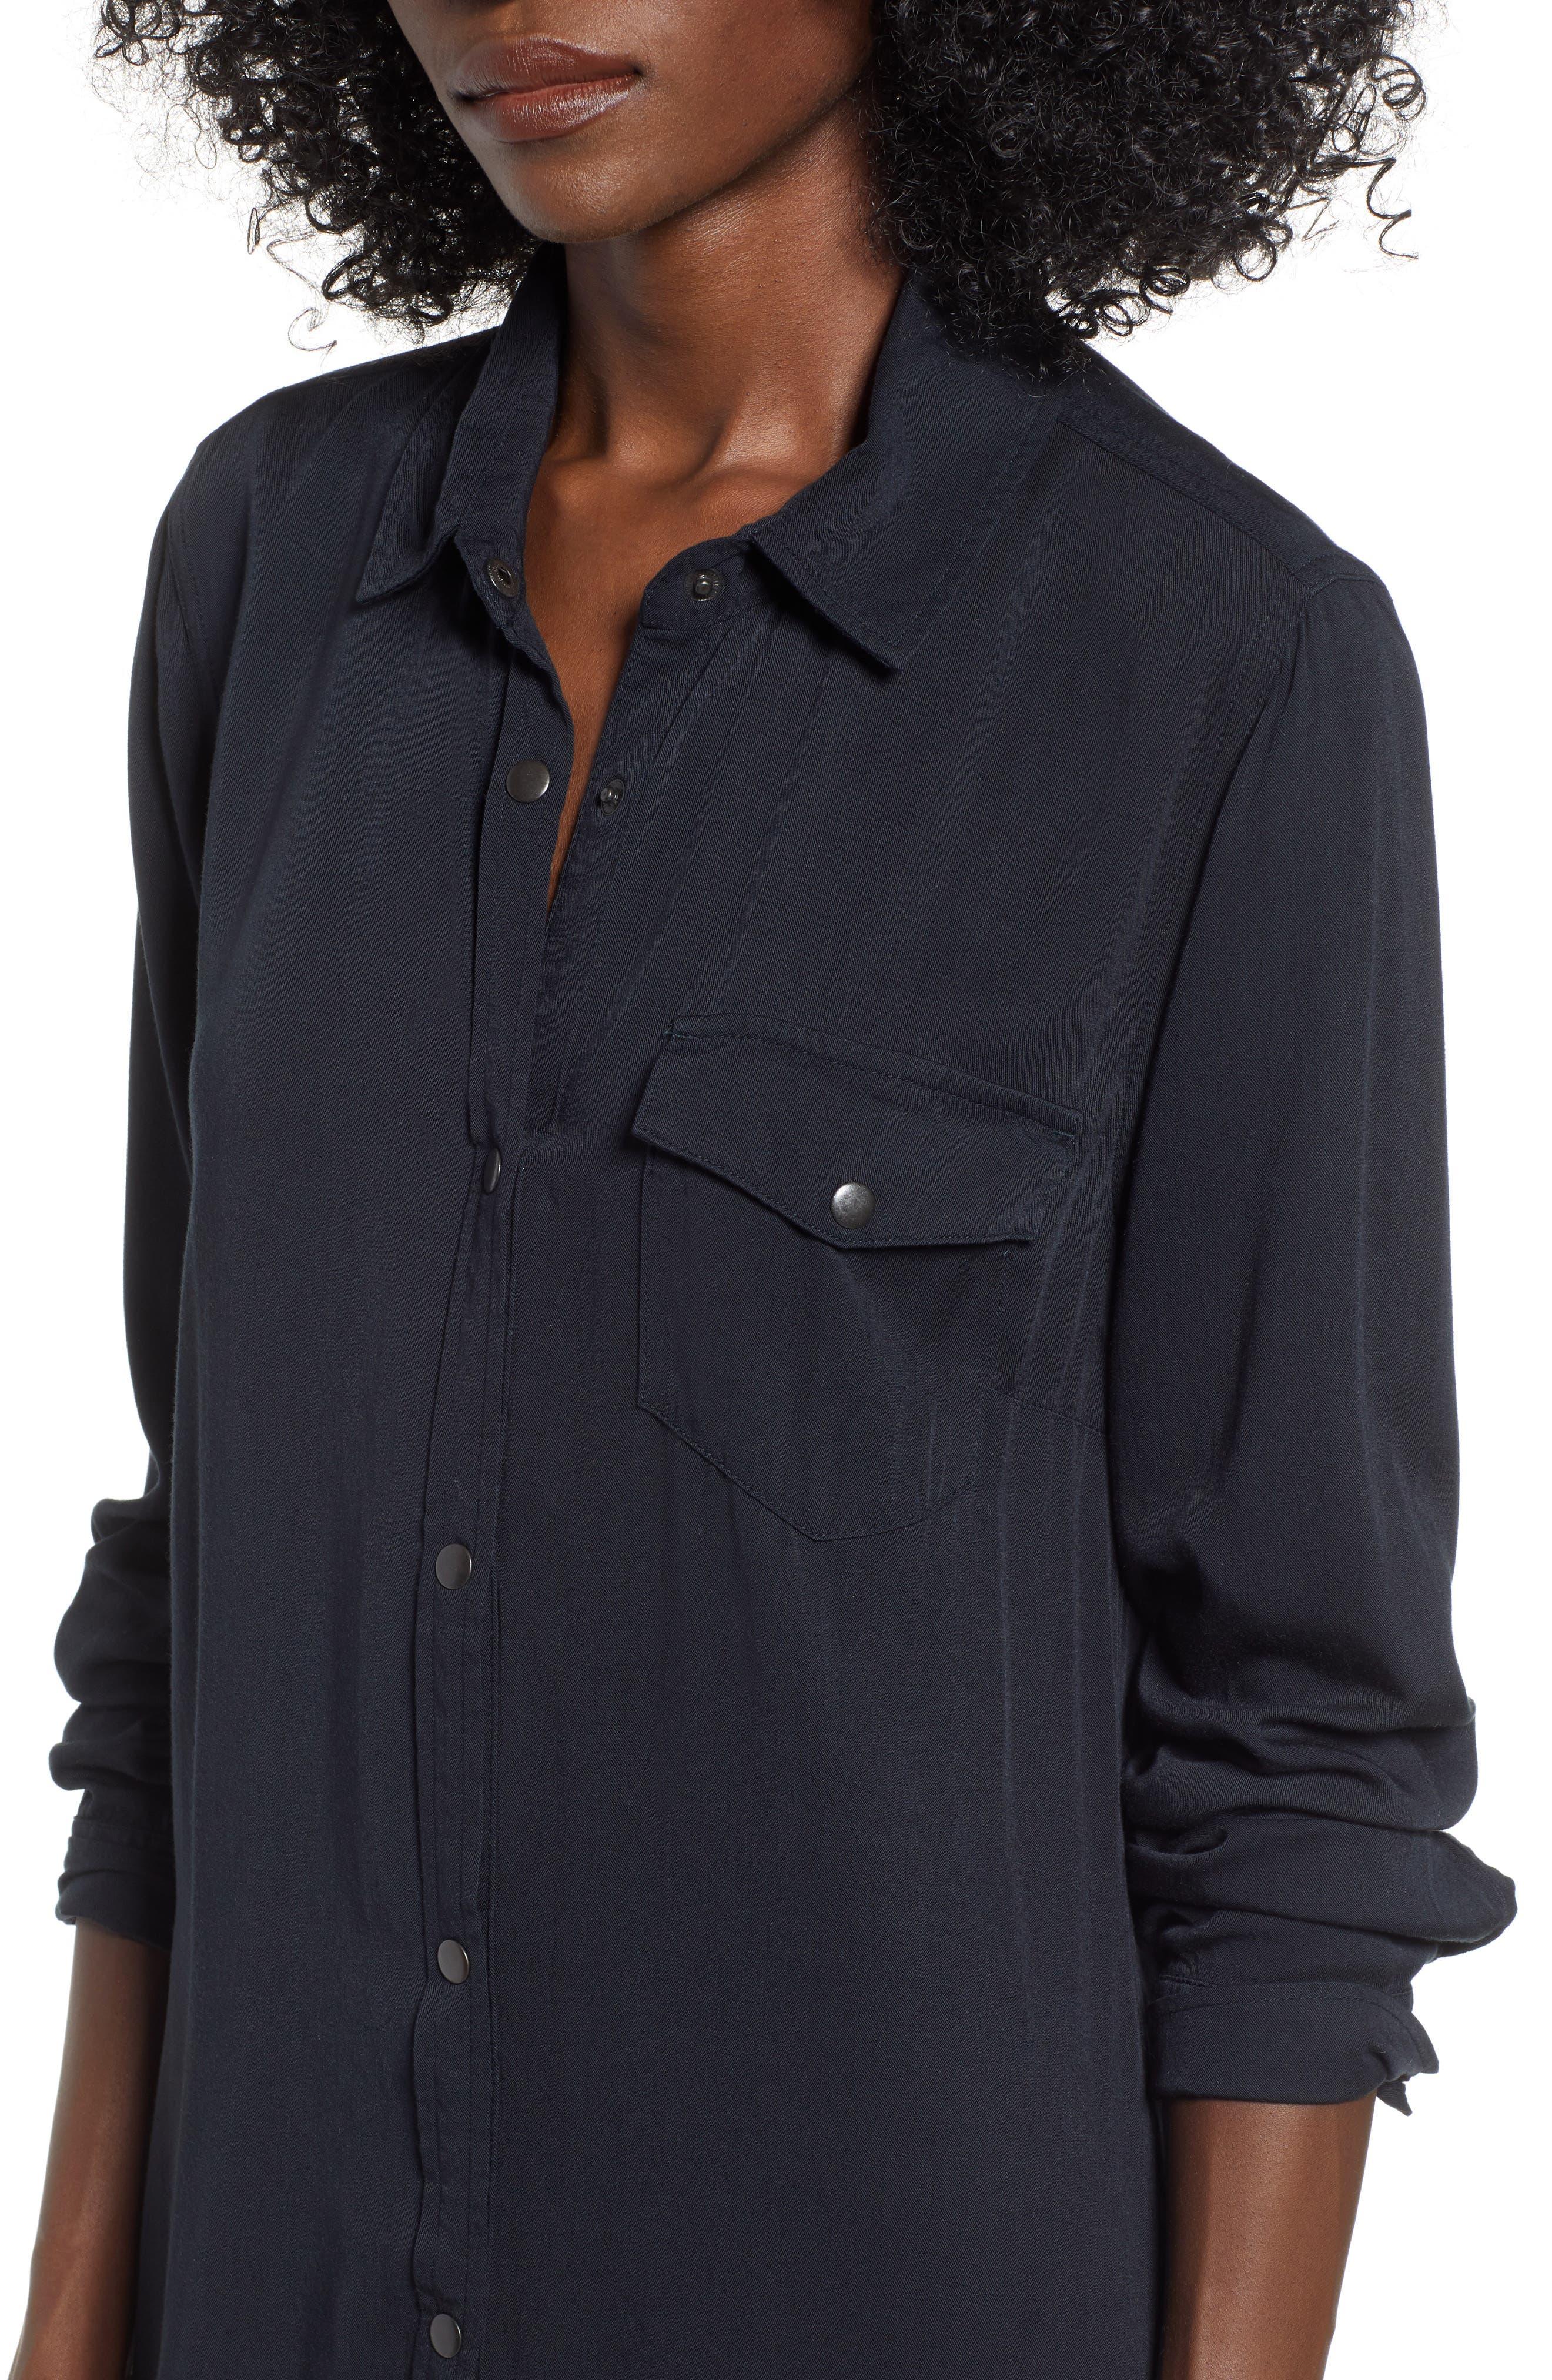 Tomini Bay View Shirtdress,                             Alternate thumbnail 4, color,                             TRUE BLACK